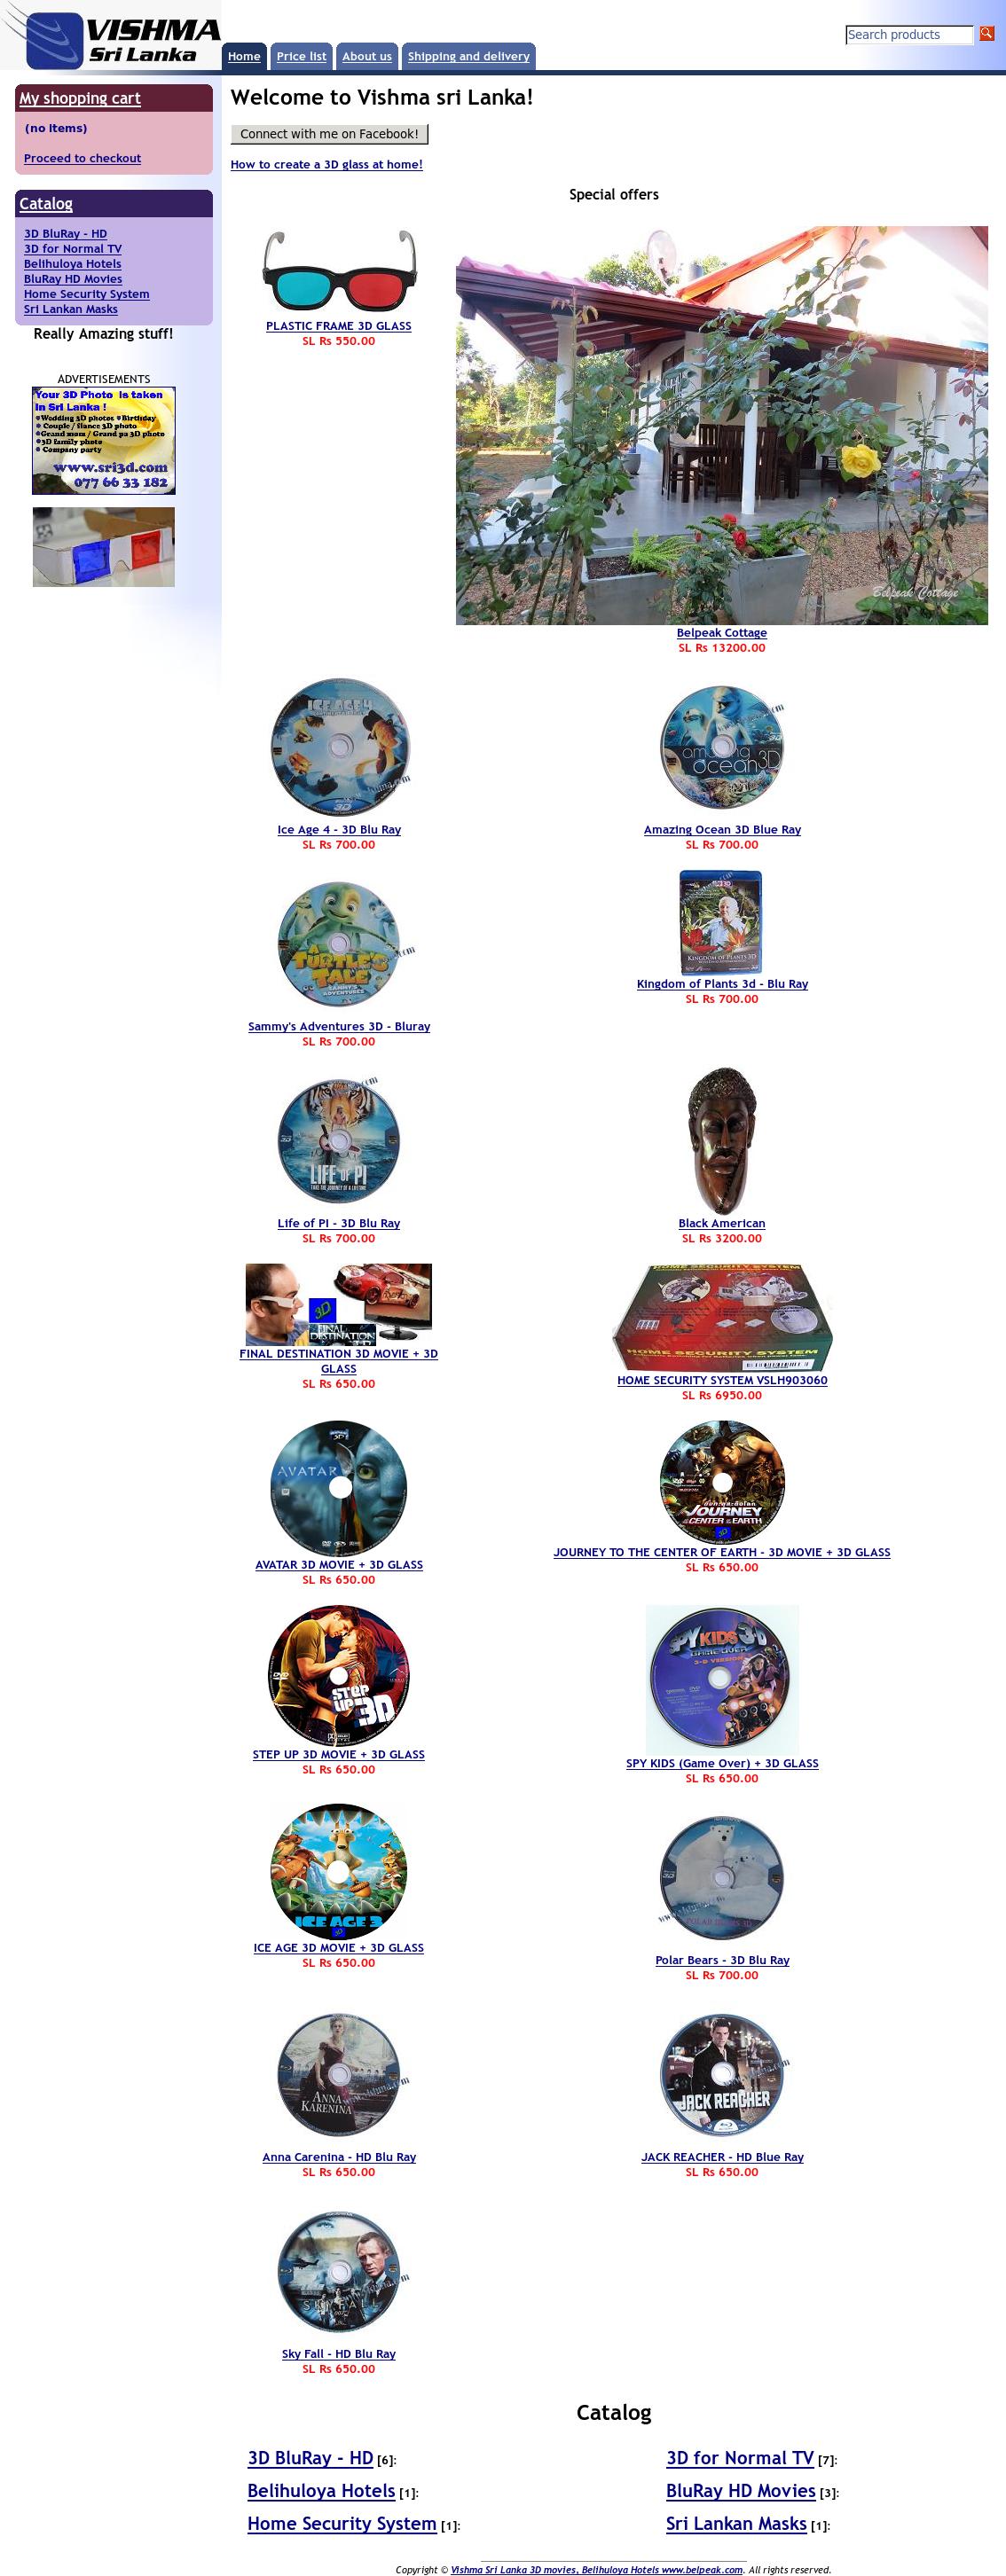 Vishma Sri Lanka Competitors, Revenue and Employees - Owler Company